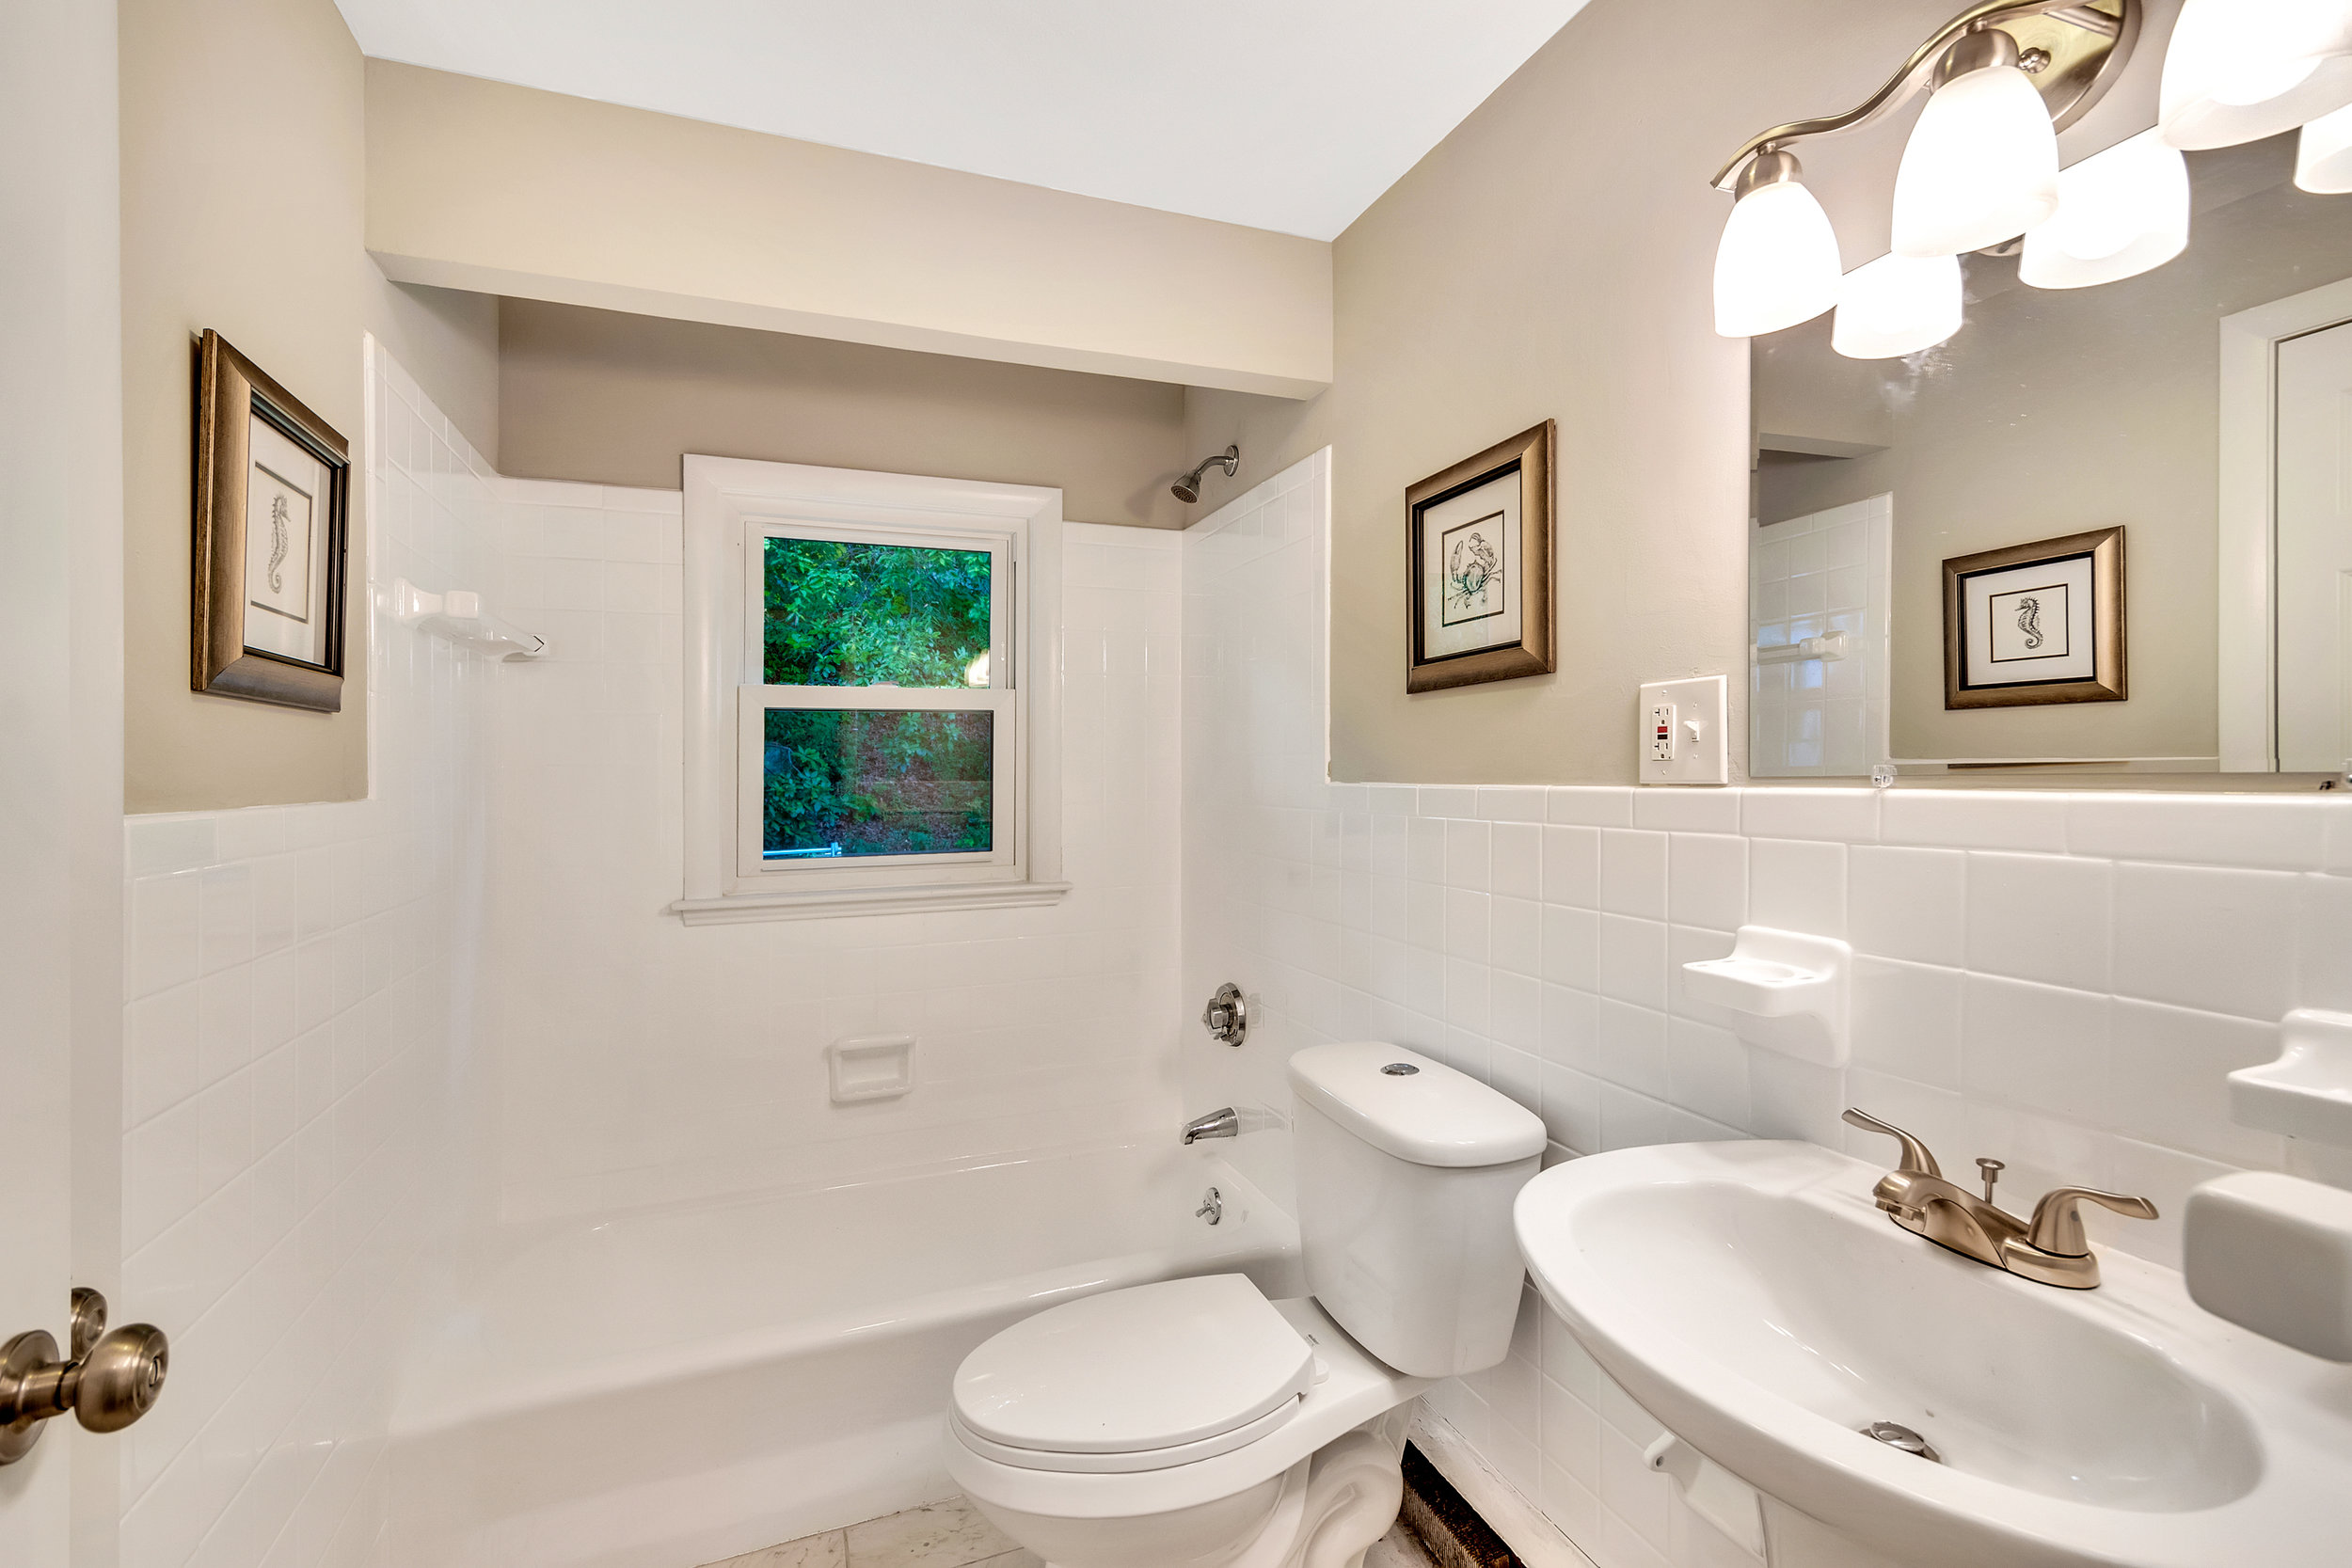 15-bathroom1.jpg